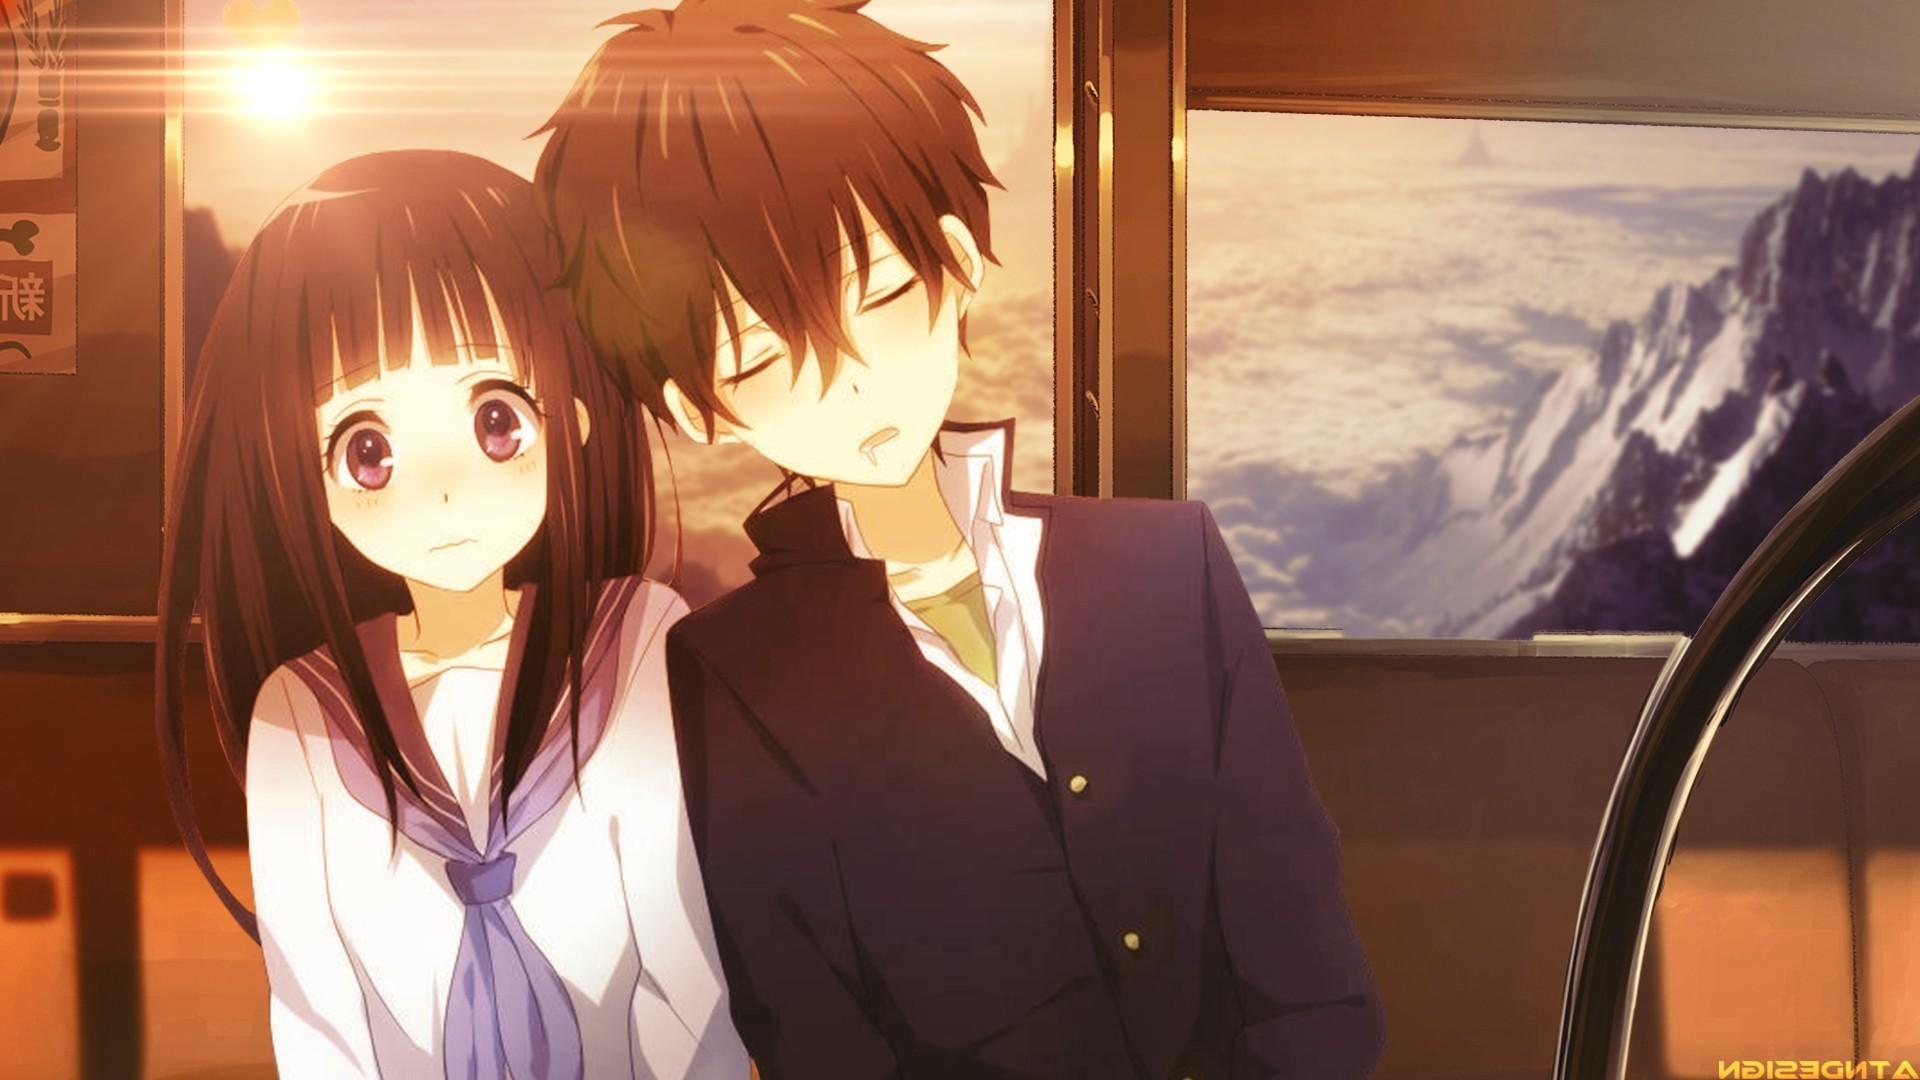 Res: 1920x1080, Cute Anime Couple Wallpaper Cute Anime Couple Wallpaper HD